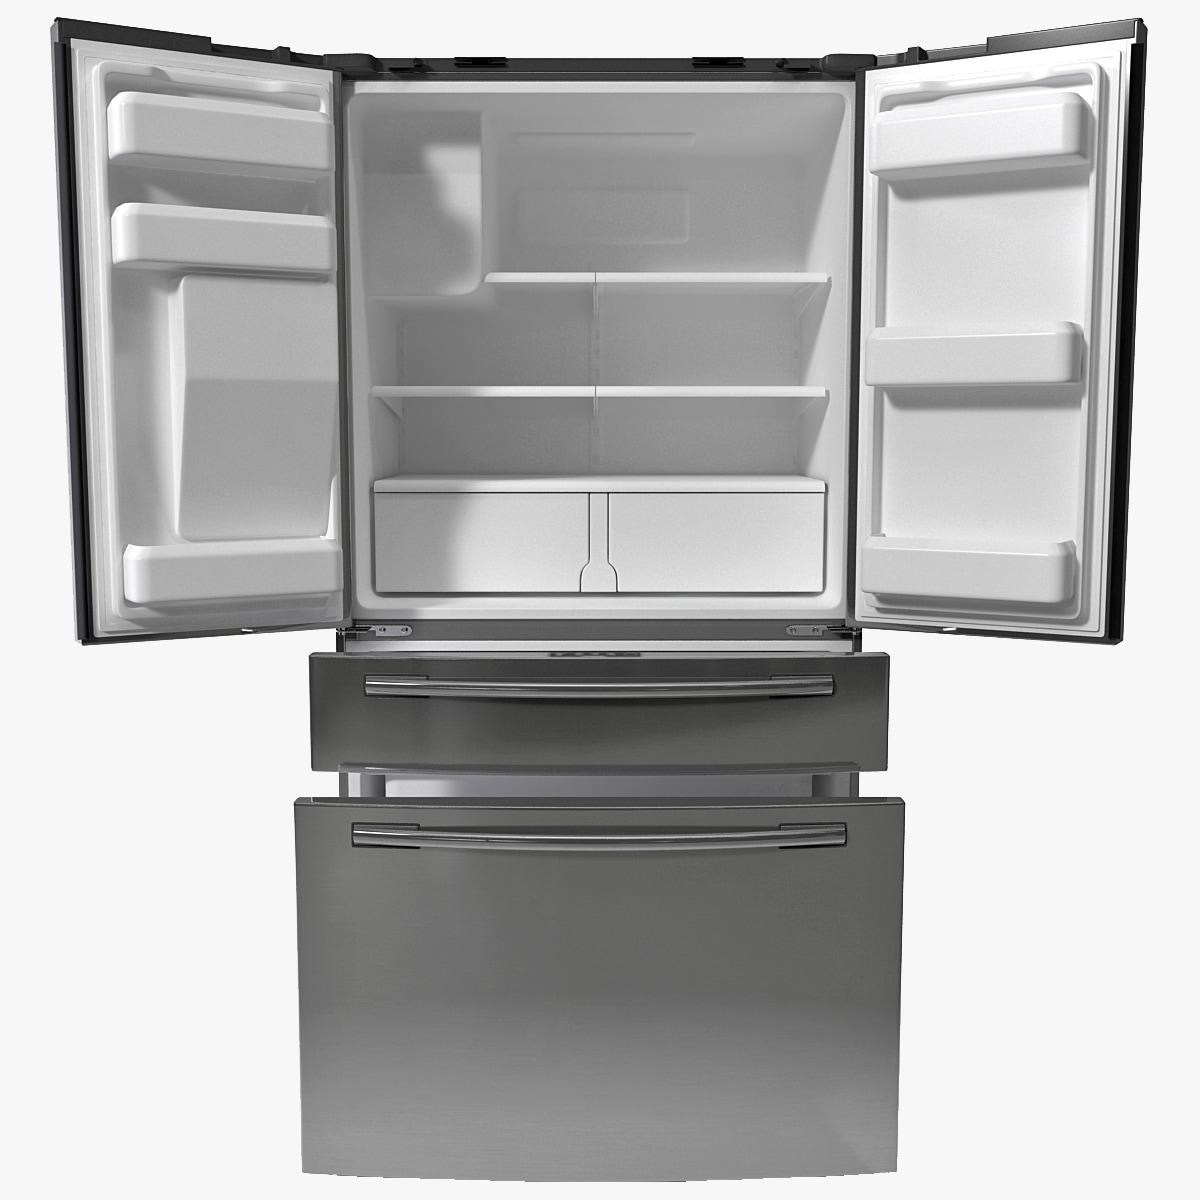 French Door Refrigerator Samsung RF4287_190.jpg